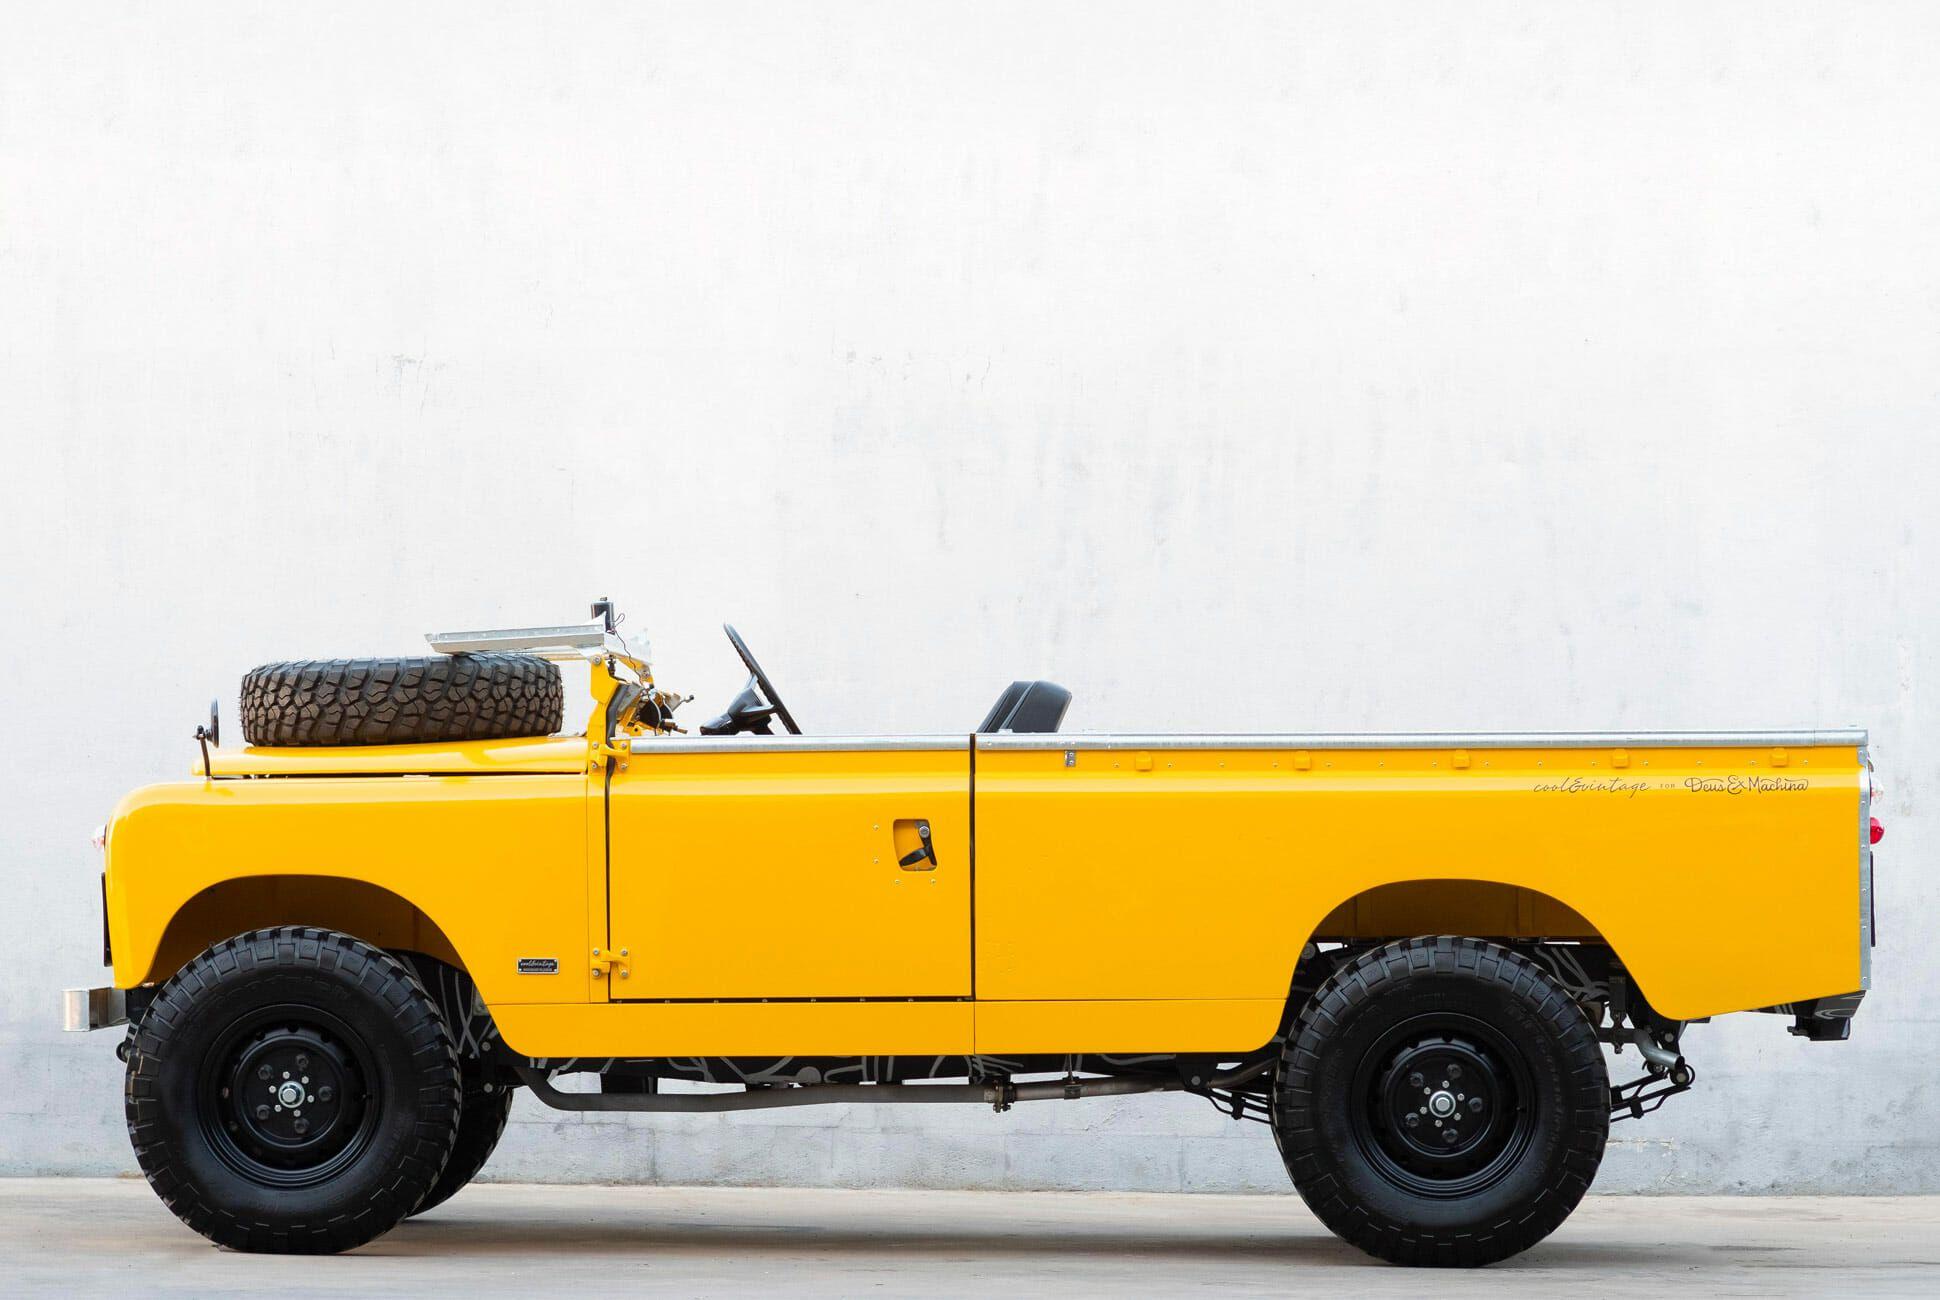 Cool-n-Vintage-x-Deus-Ex-Machina-Land-Rover-Yellow-Landmarine-gear-patrol-slide-2